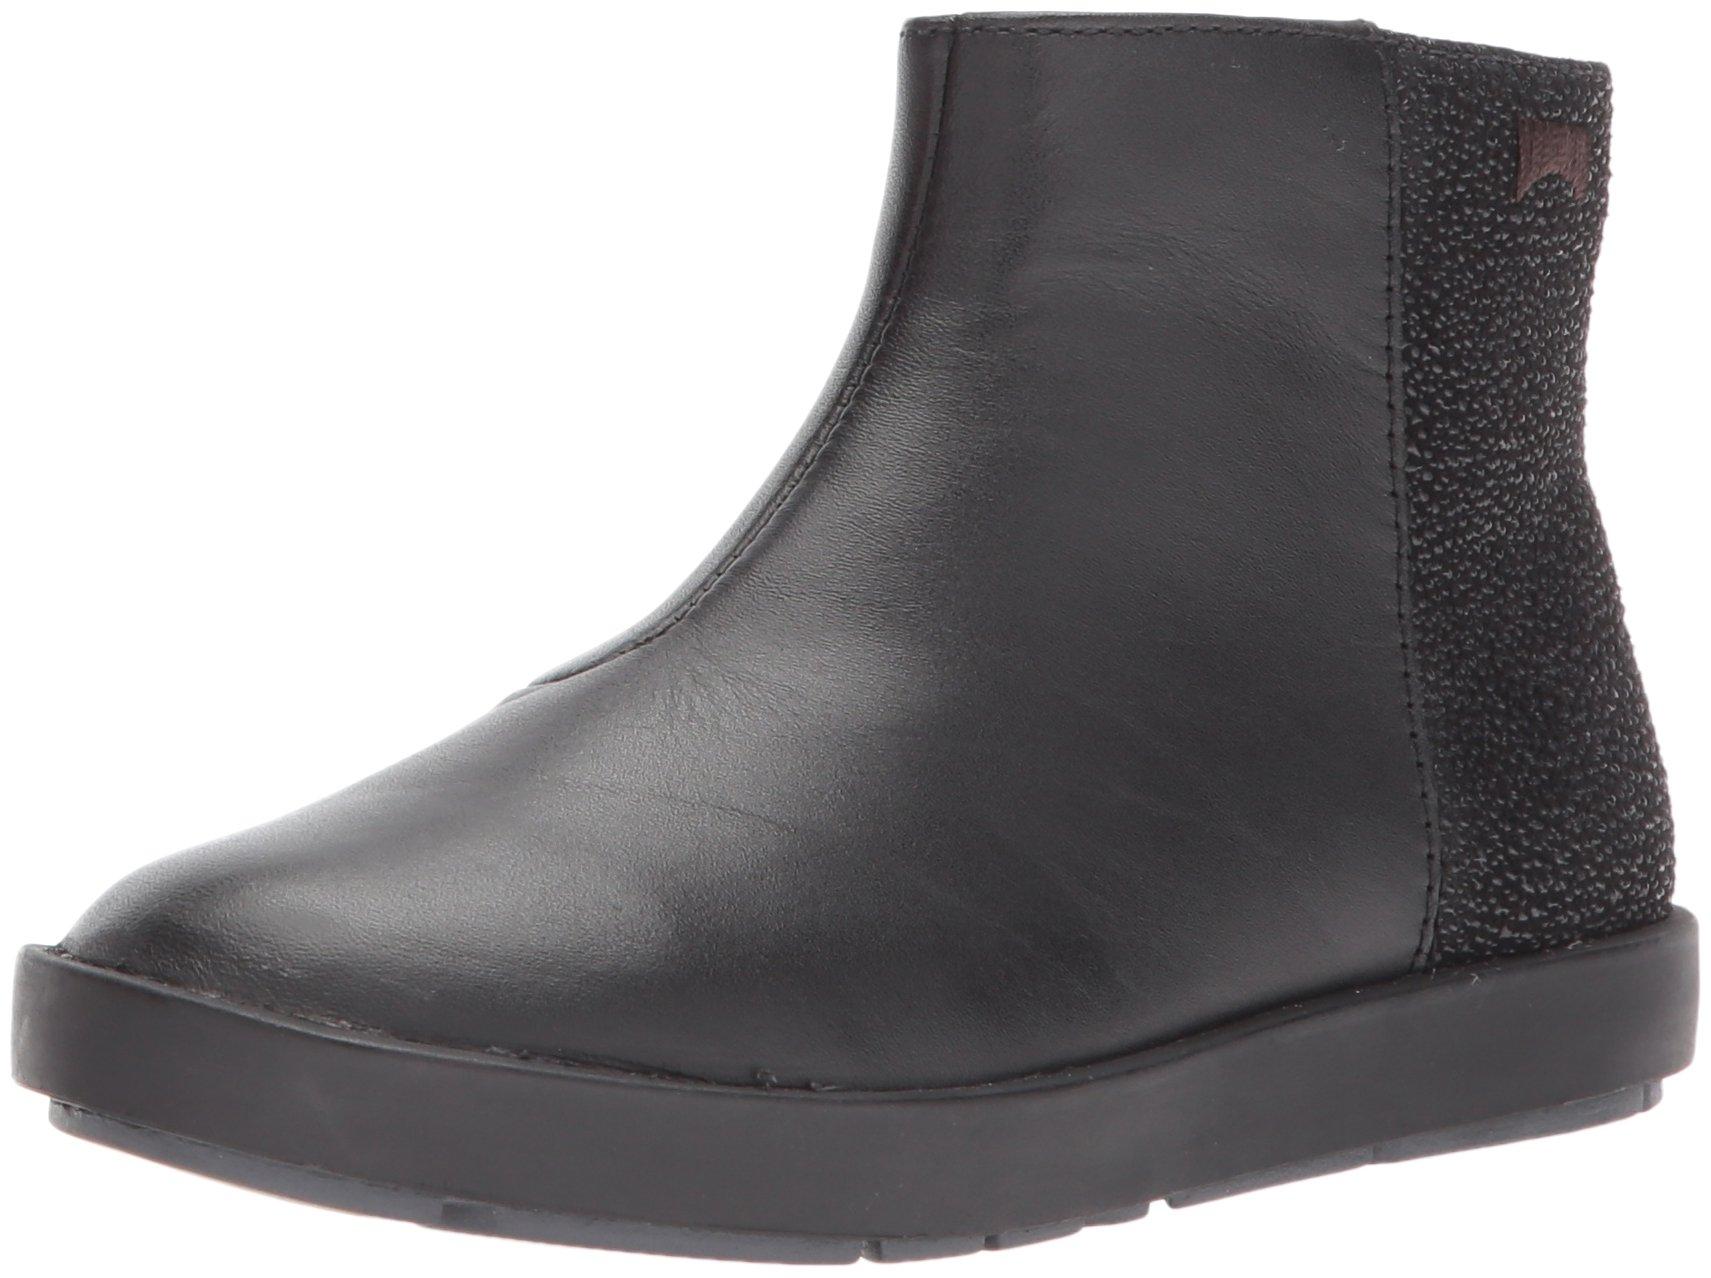 Camper Kids Girls' Leonor Ankle Boot, Black, 36 D EU Big Kid (4 US)